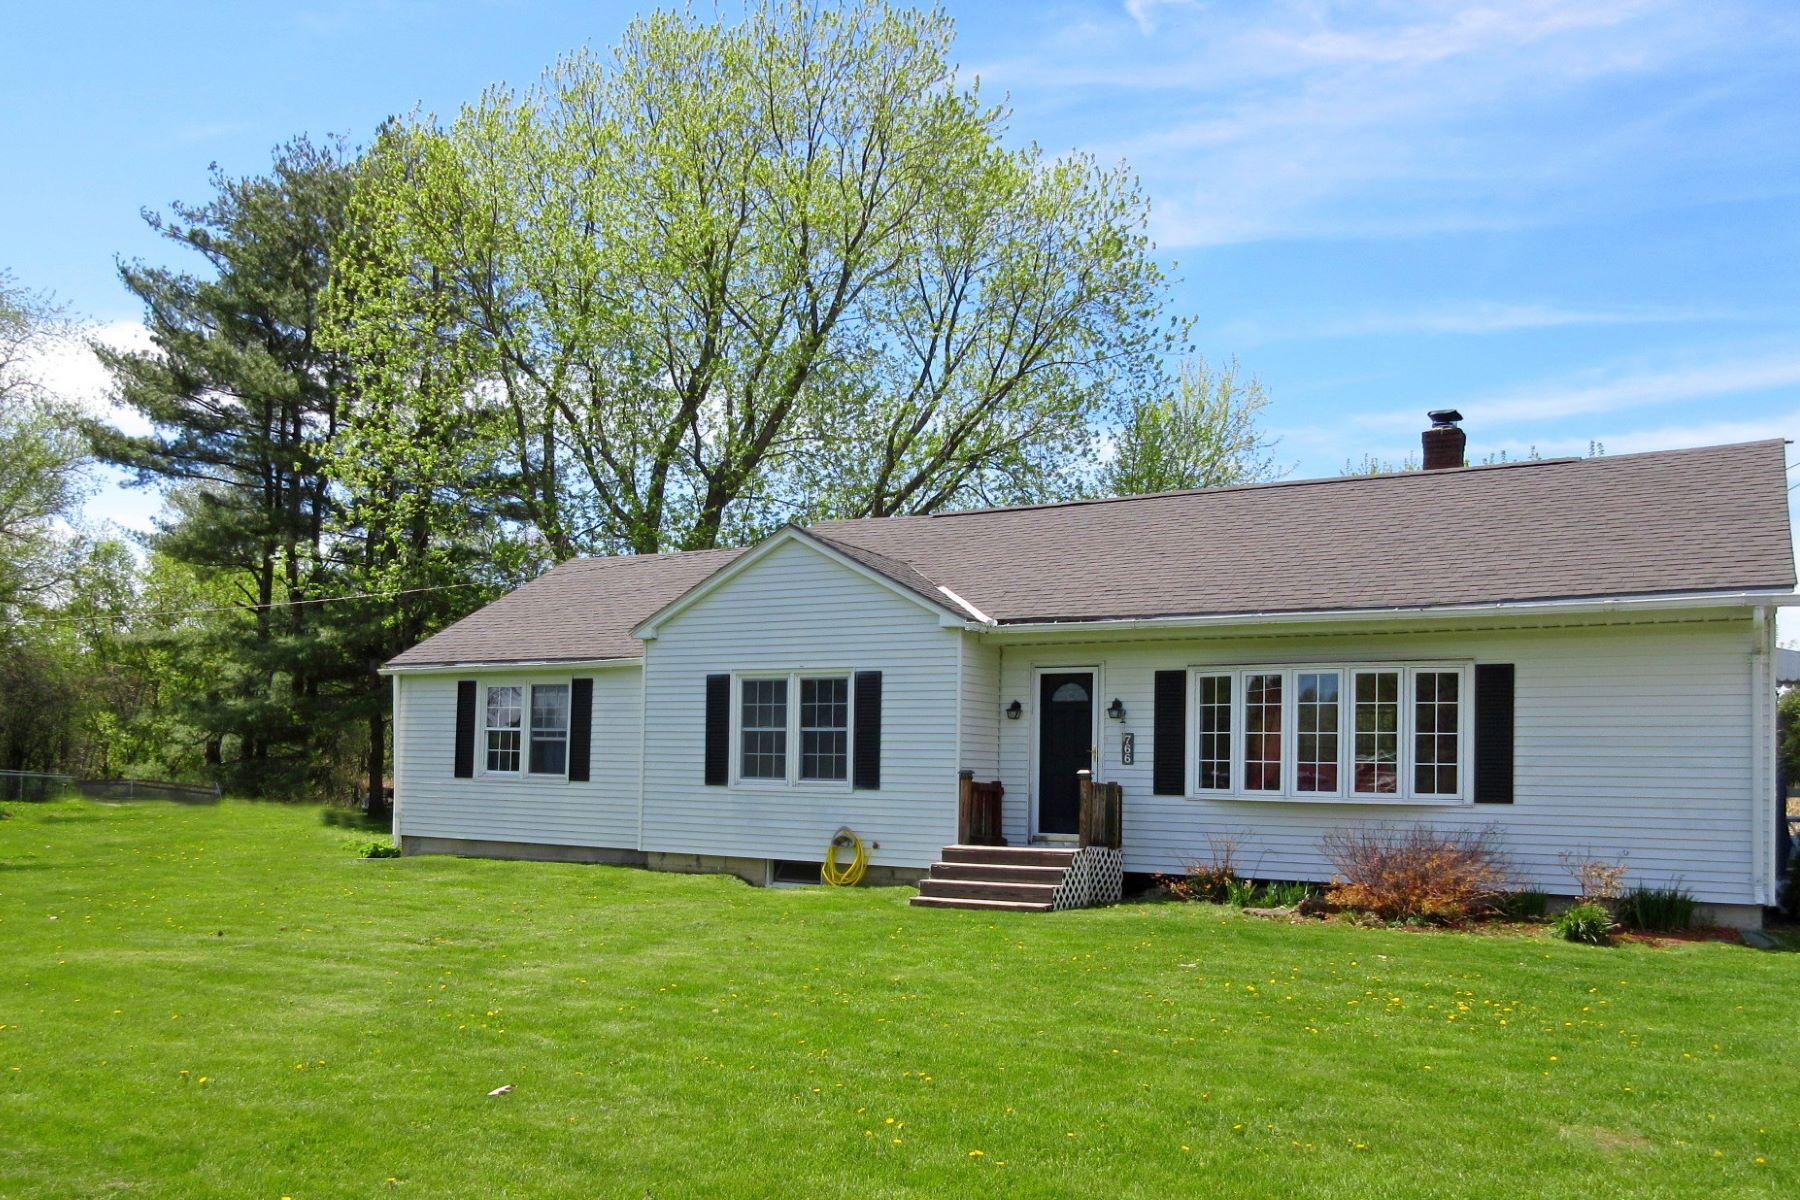 single family homes for Sale at 766 Park Street, Brandon 766 Park St Brandon, Vermont 05733 United States